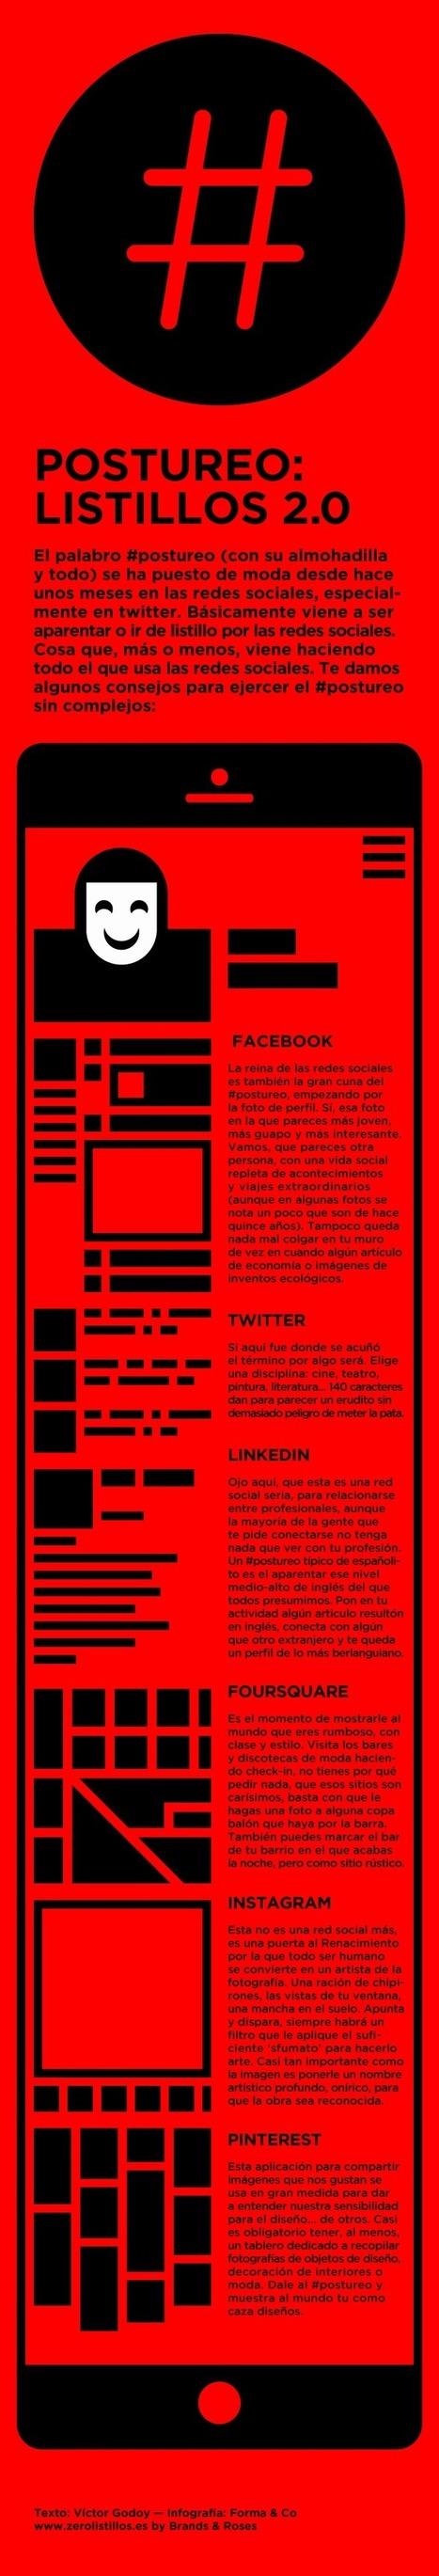 Cómo hacer #postureo en Redes Sociales #infografia #infographic #socialmedia | Seo, Social Media Marketing | Scoop.it